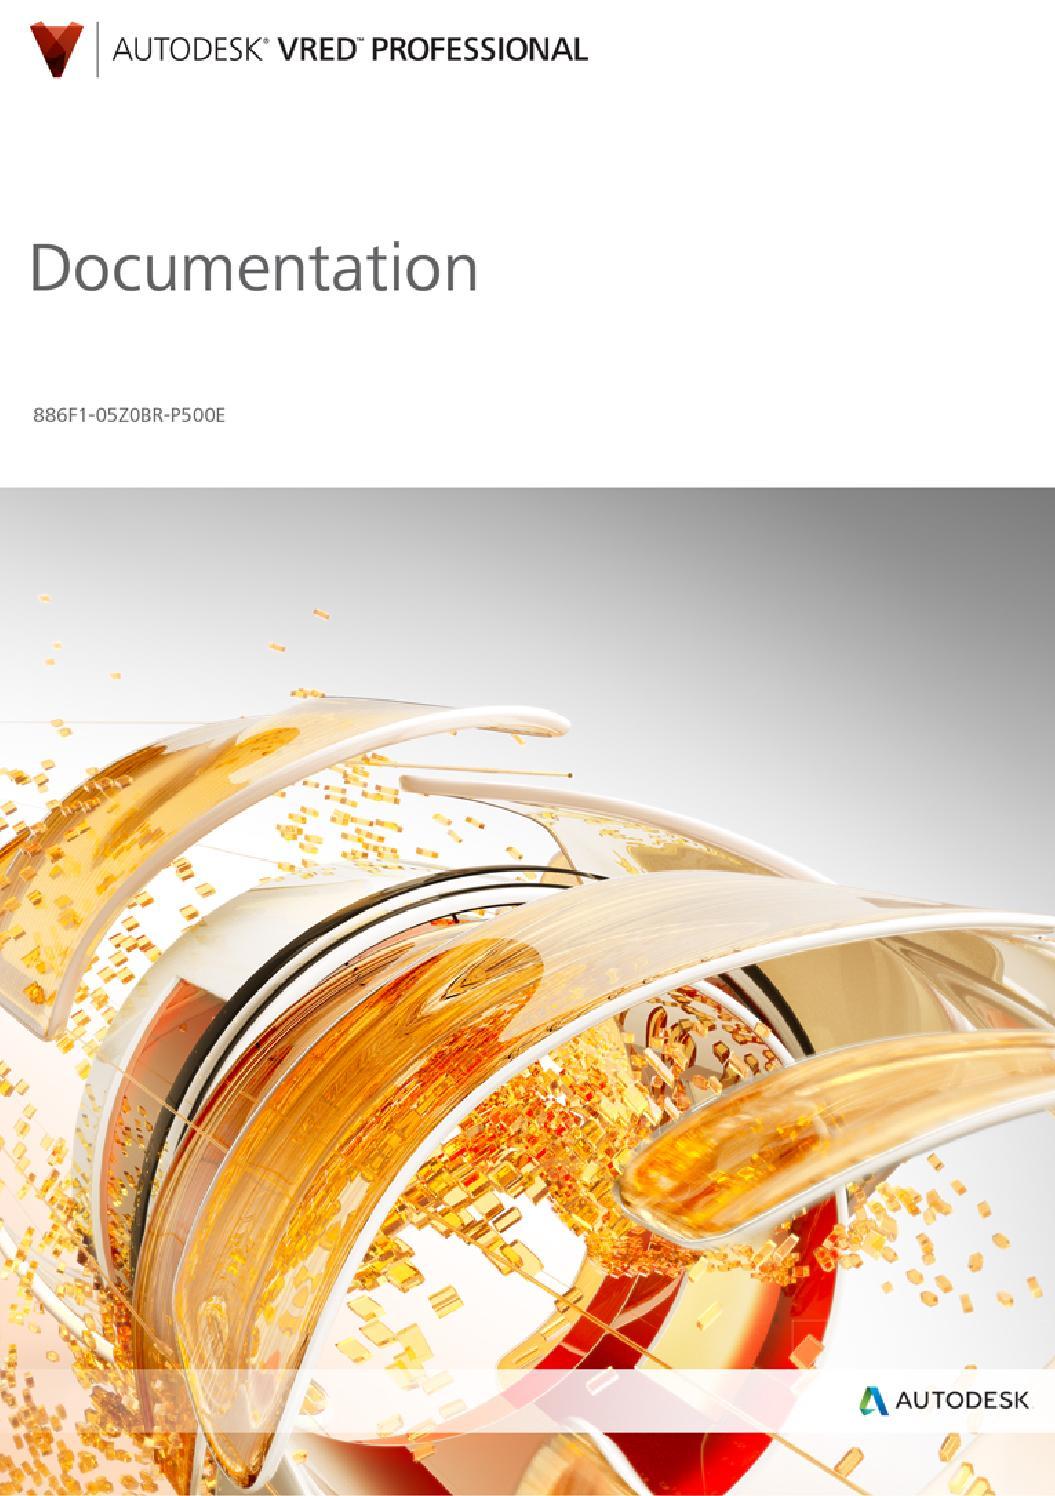 VRED professional 2014: Documentation by MCD Media